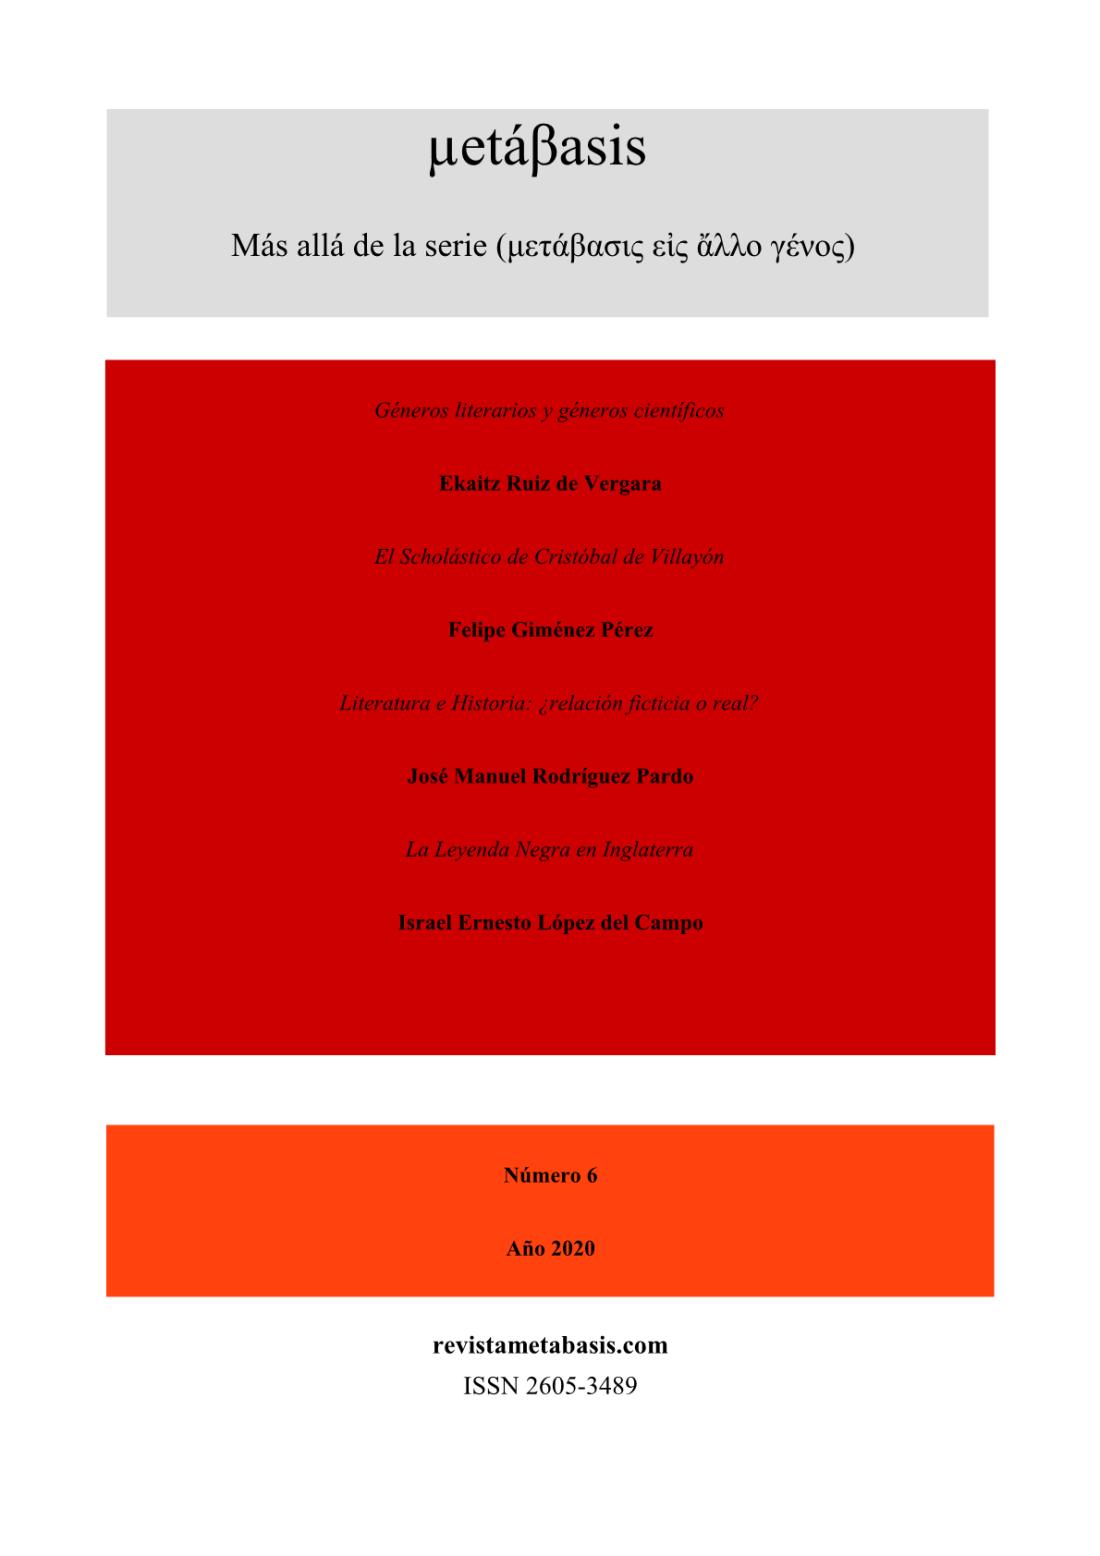 Revista Metábasis Número 6 (2020) Tapa1